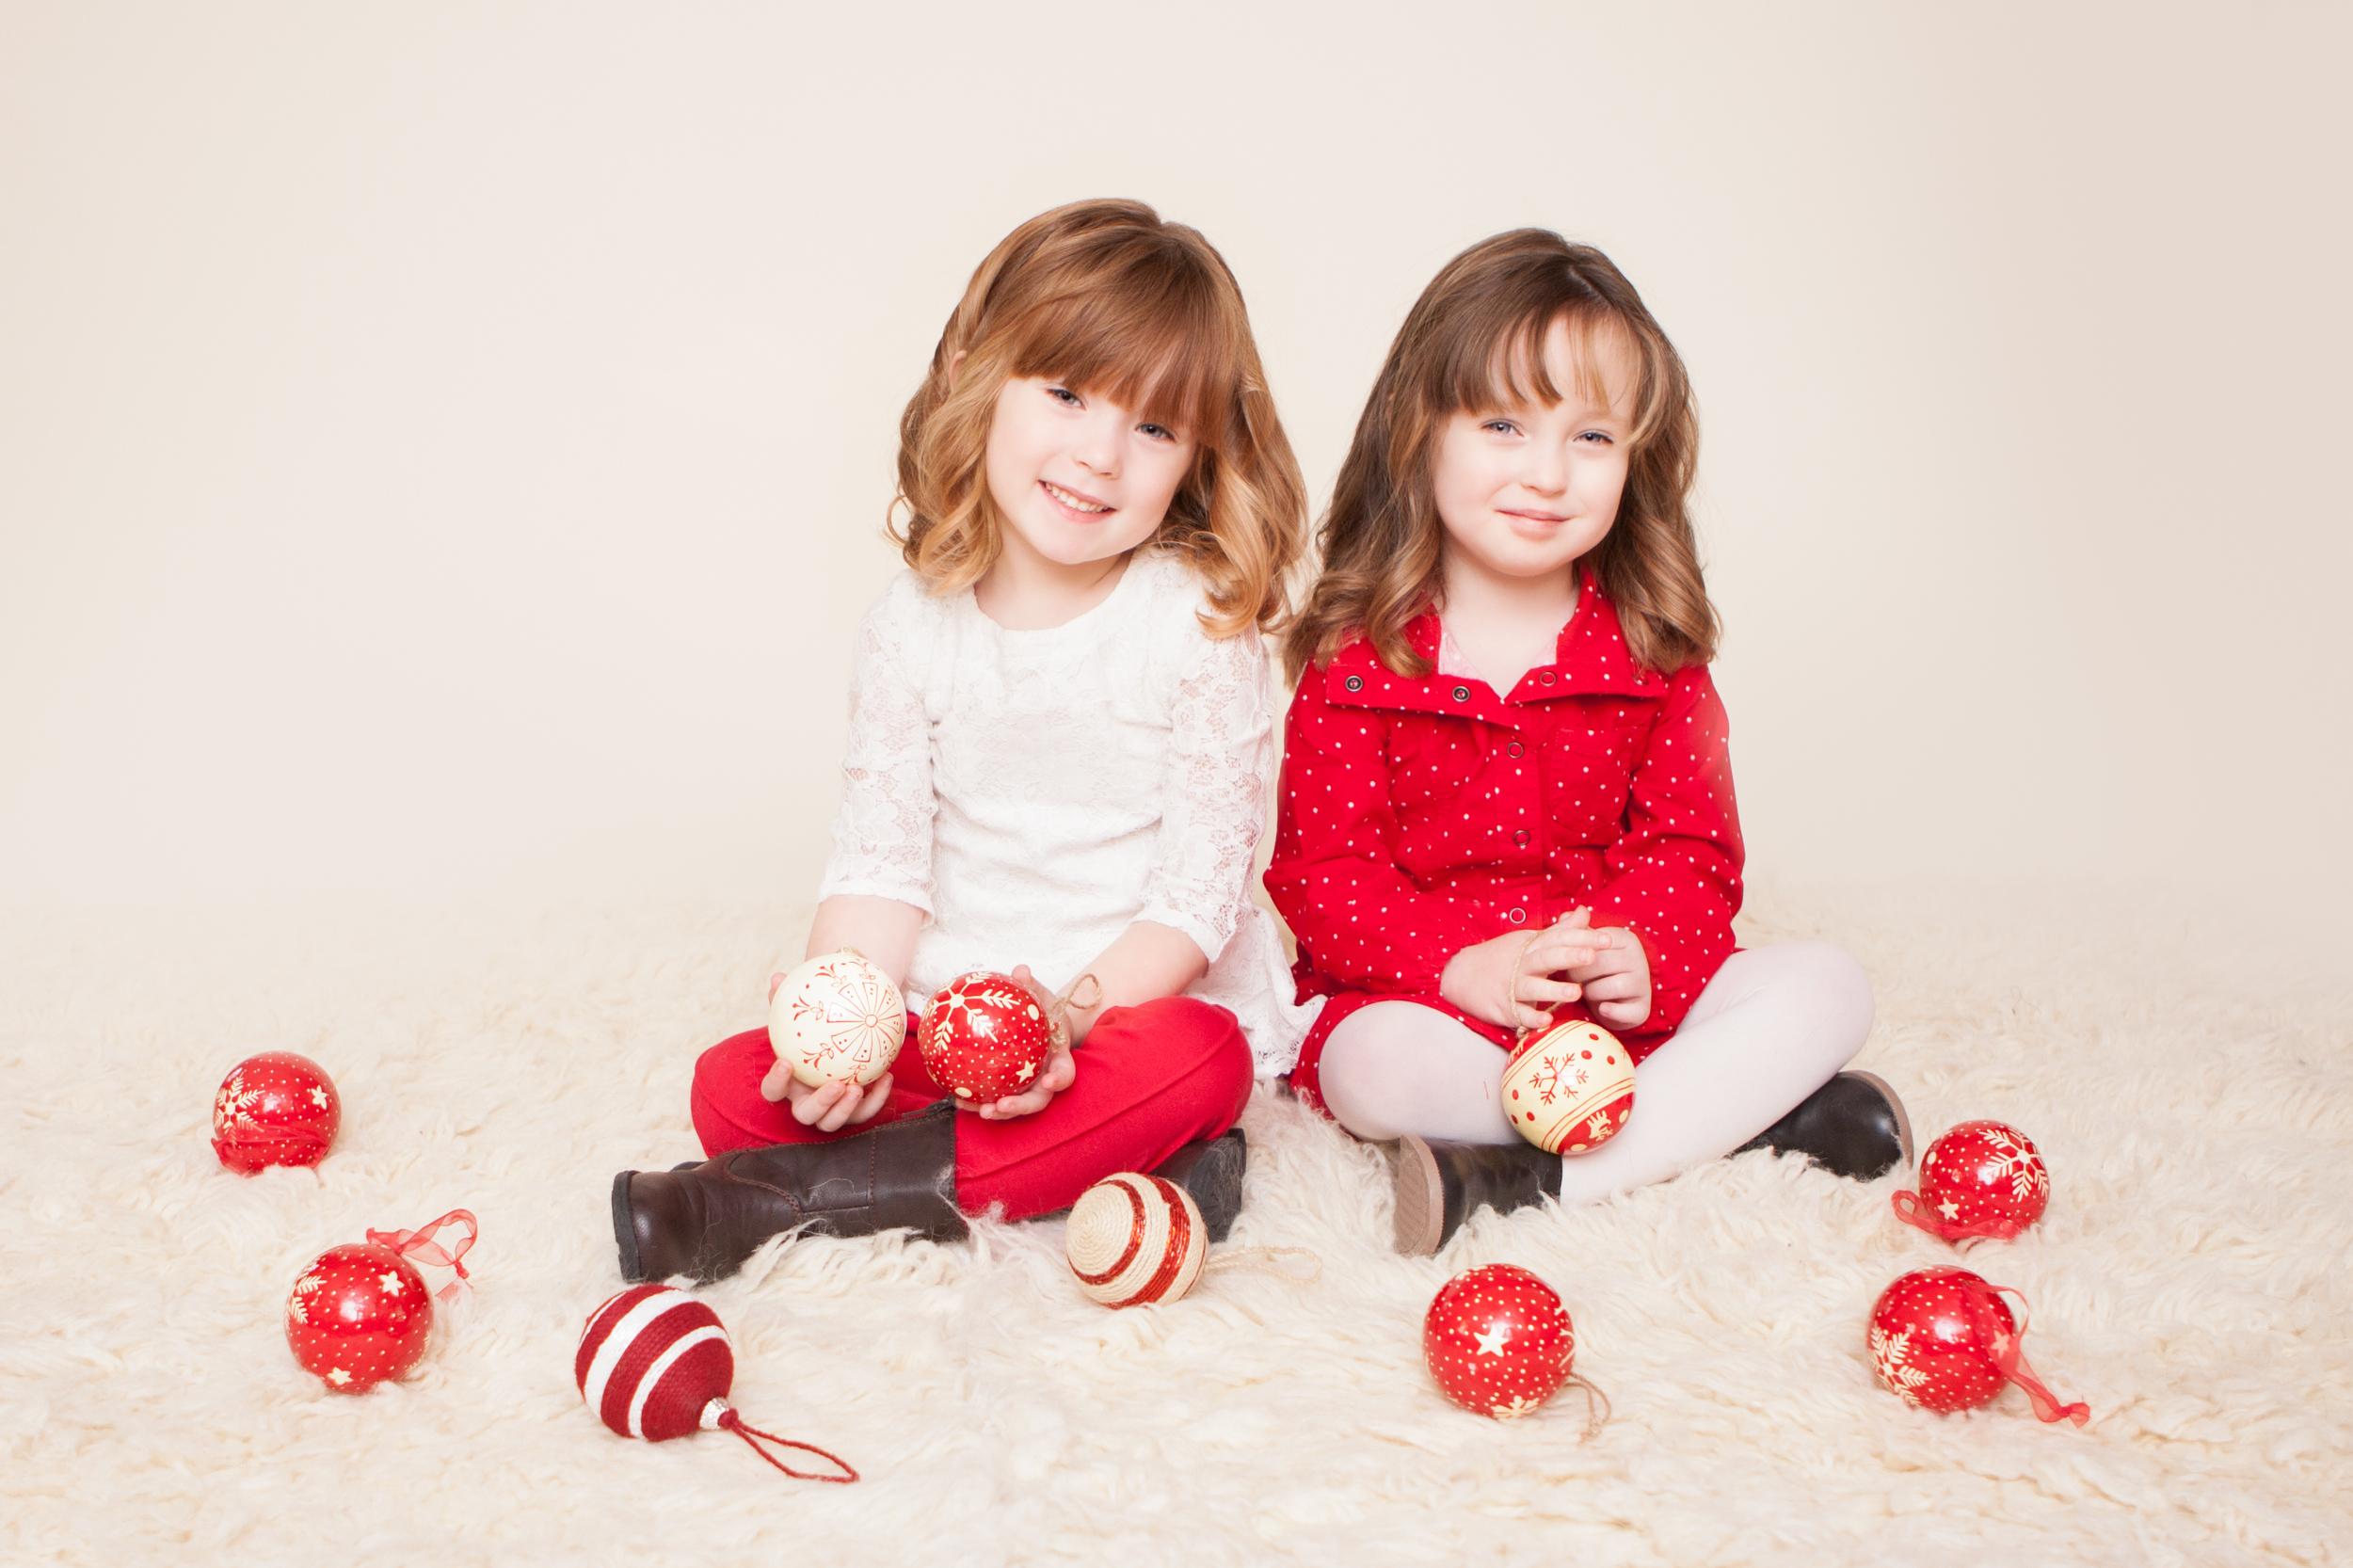 Holiday Christmas Photography Holiday Mini Sessions by Westchester County, NY and Manhattan / New York City, NY Newborn, Baby, Maternity, Child, Family Photographer, Amanda Noelle Photography.